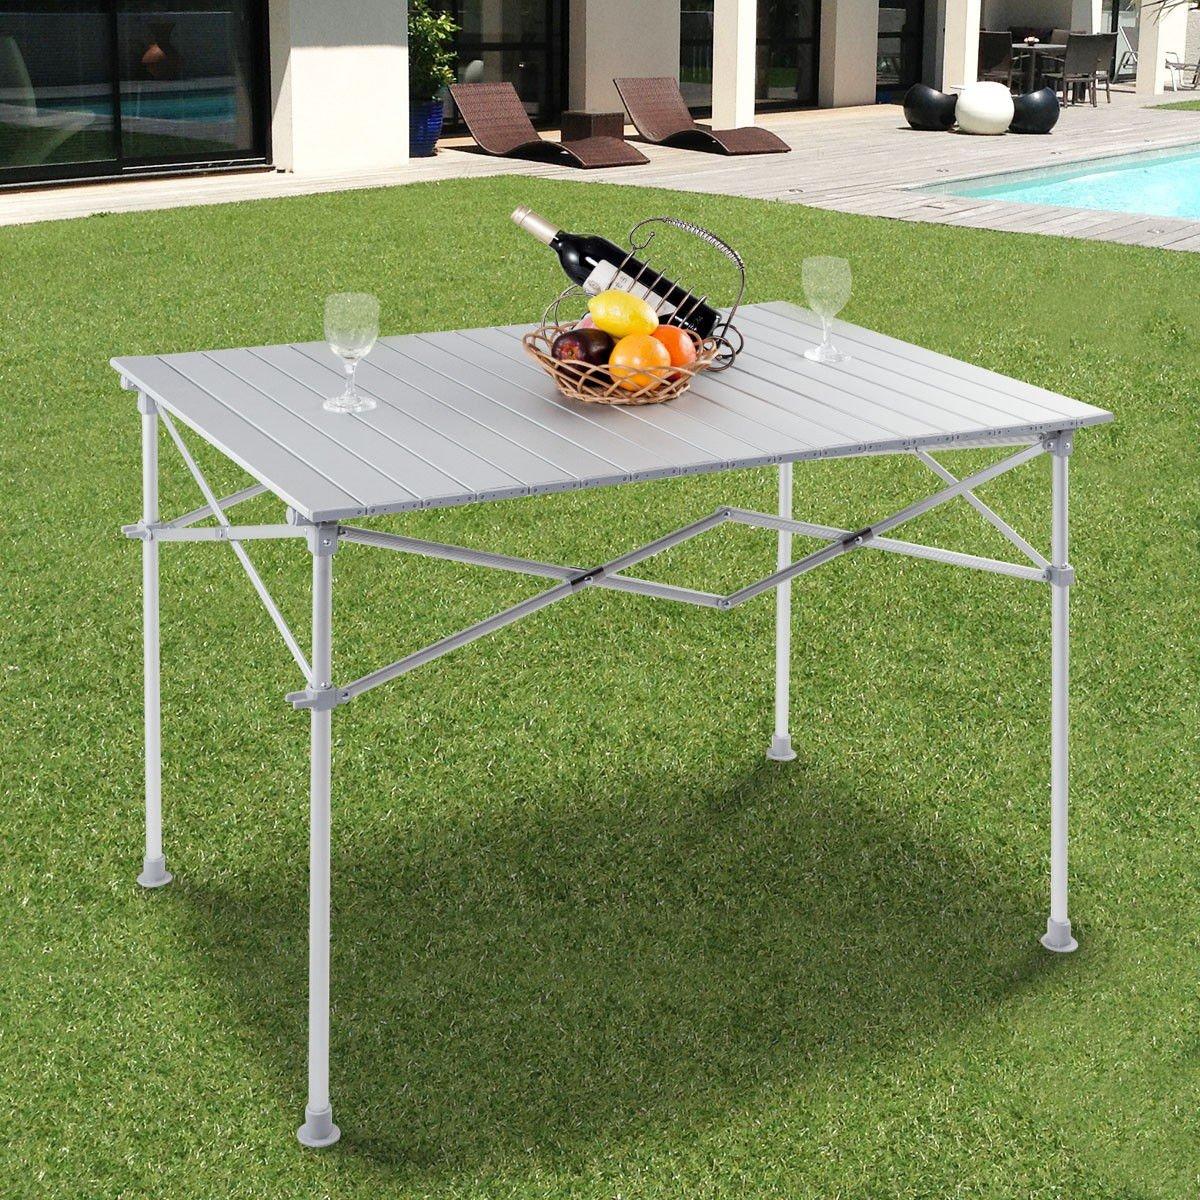 MD Group Picnic Camping Table Folding Design Aluminum Lightweight Indoor Outdoor Patio Garden BBQ Desk